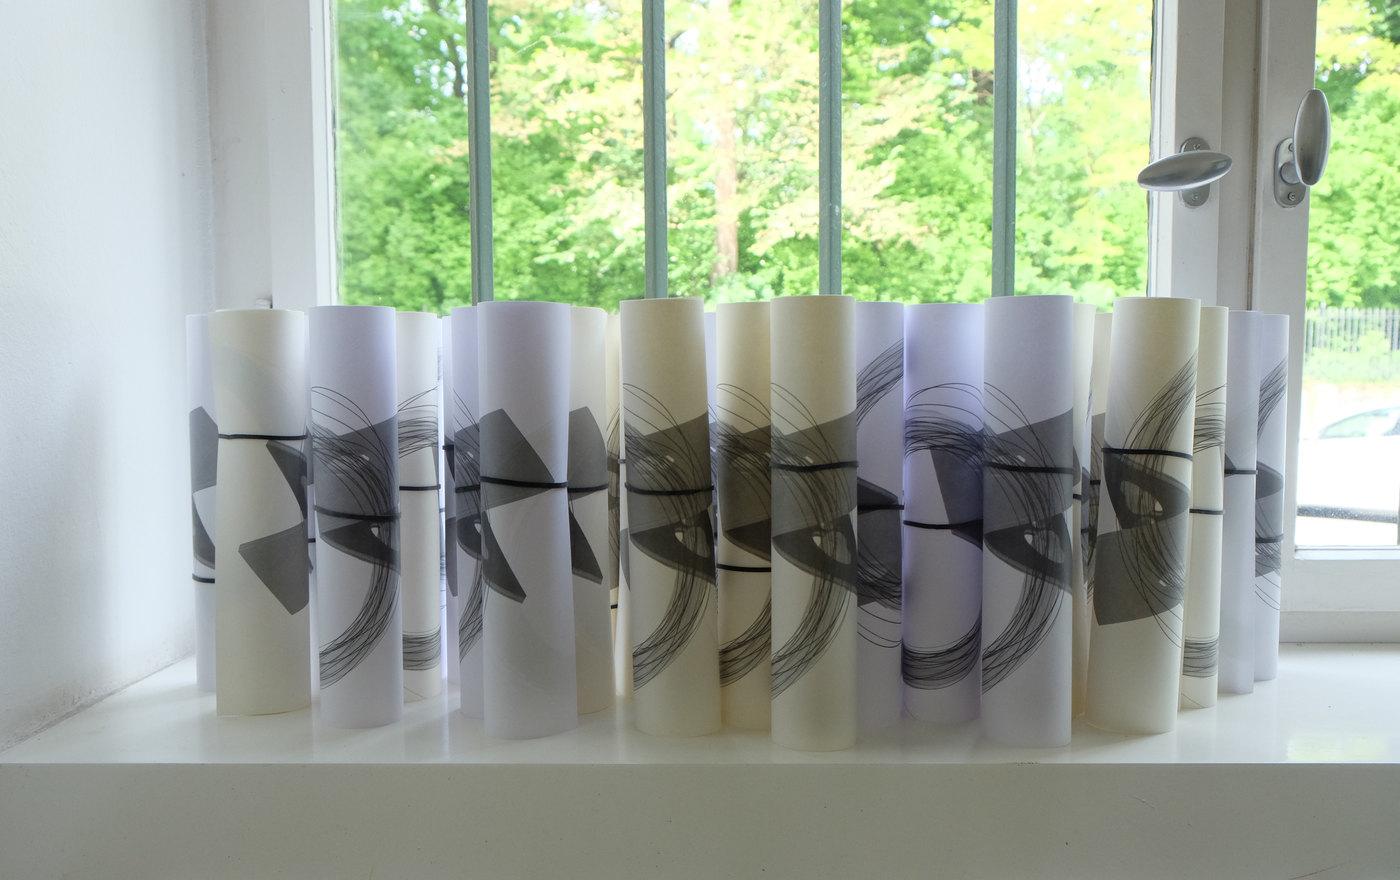 Jessica Warboys Edition Kunstverein München e.V.